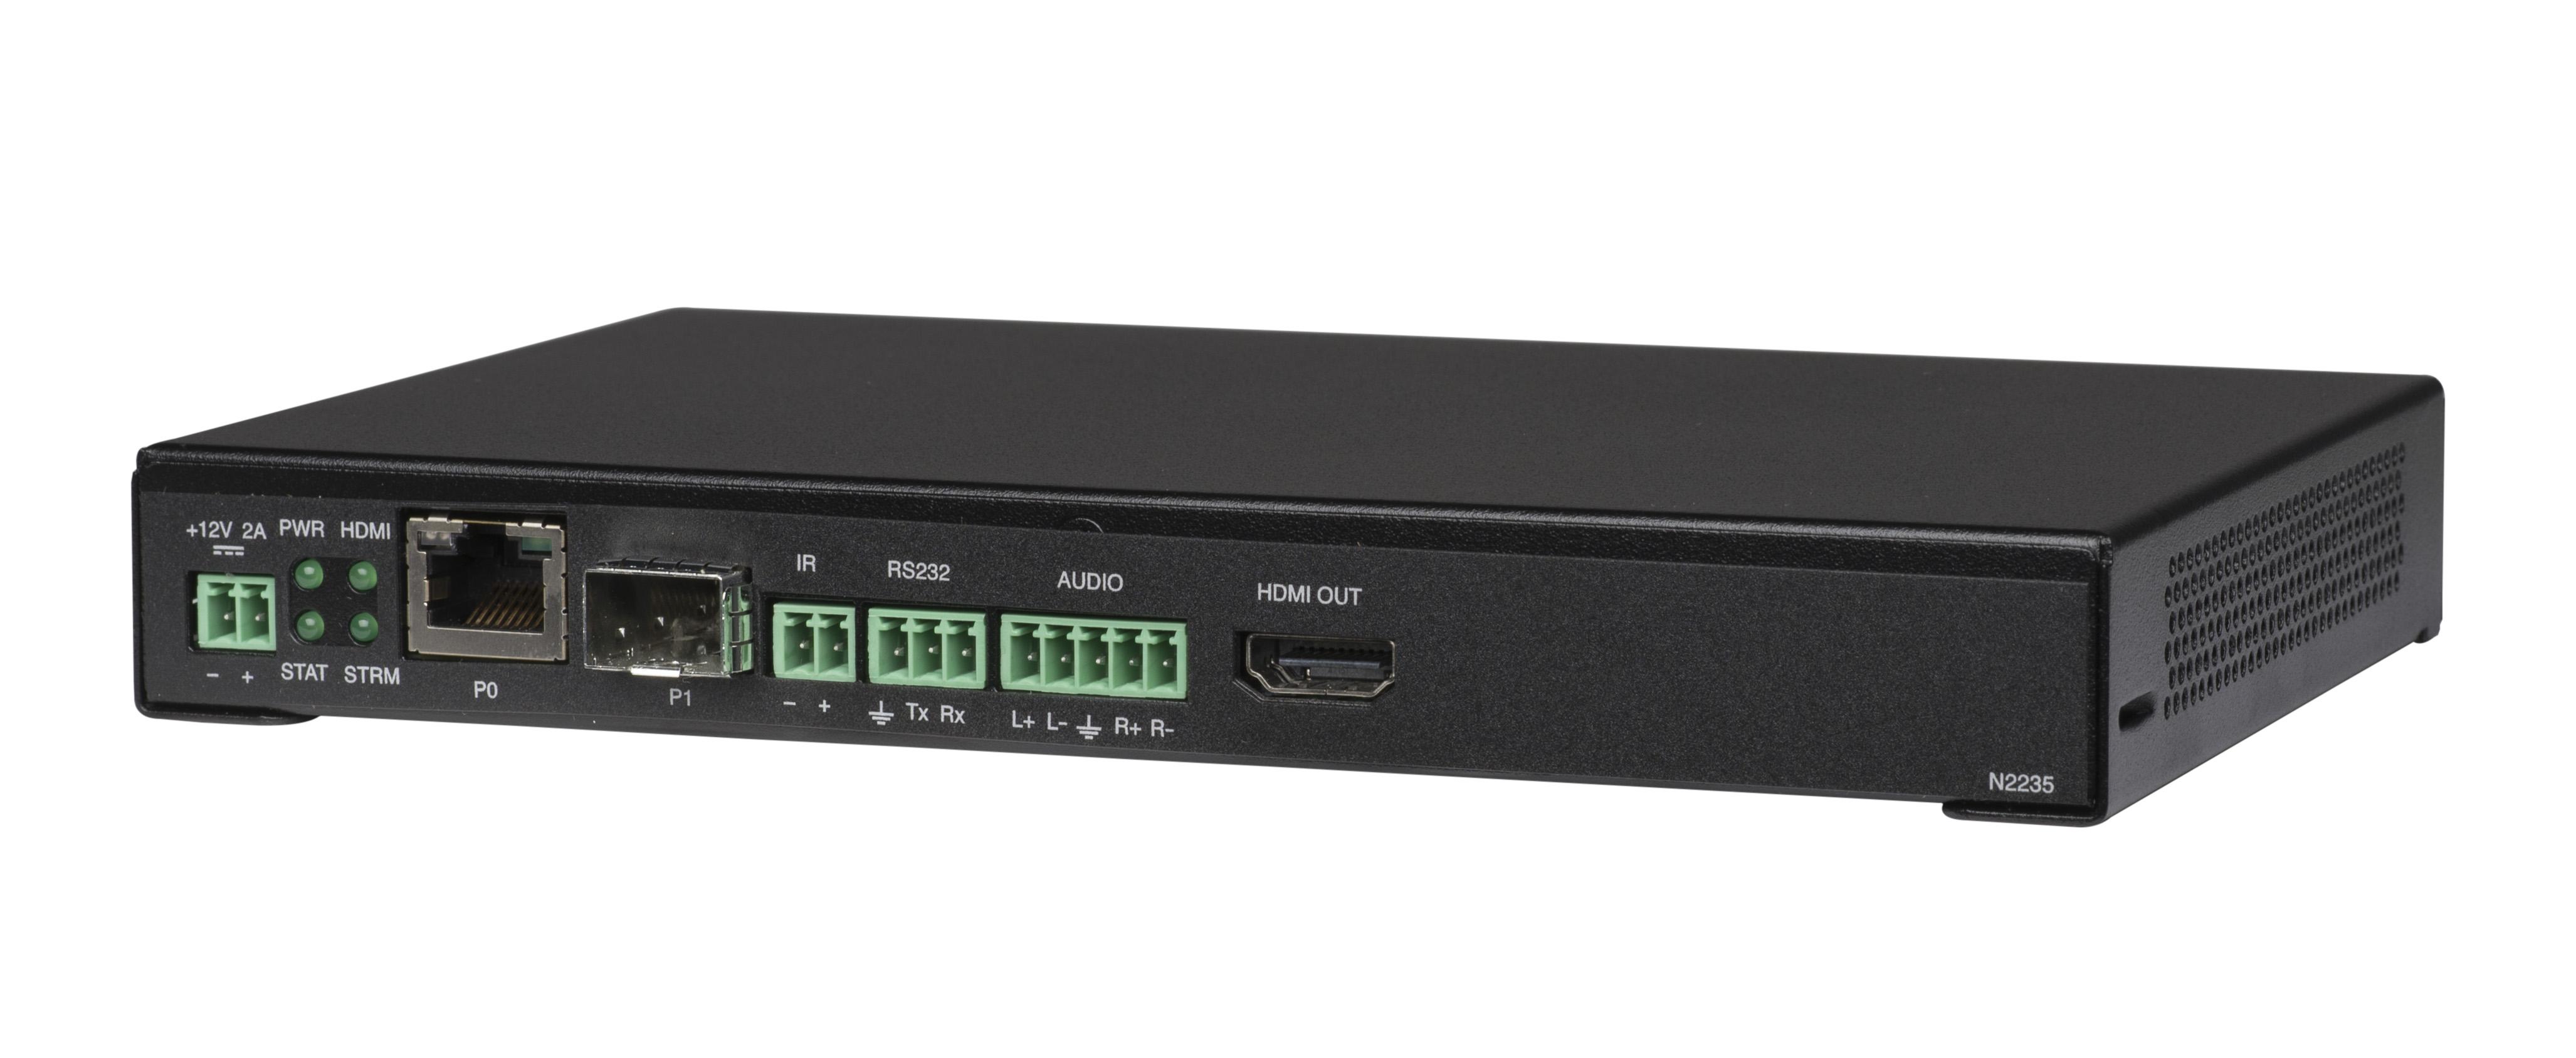 NMX-DEC-N2235A Decoder | AMX Audio Video Control Systems